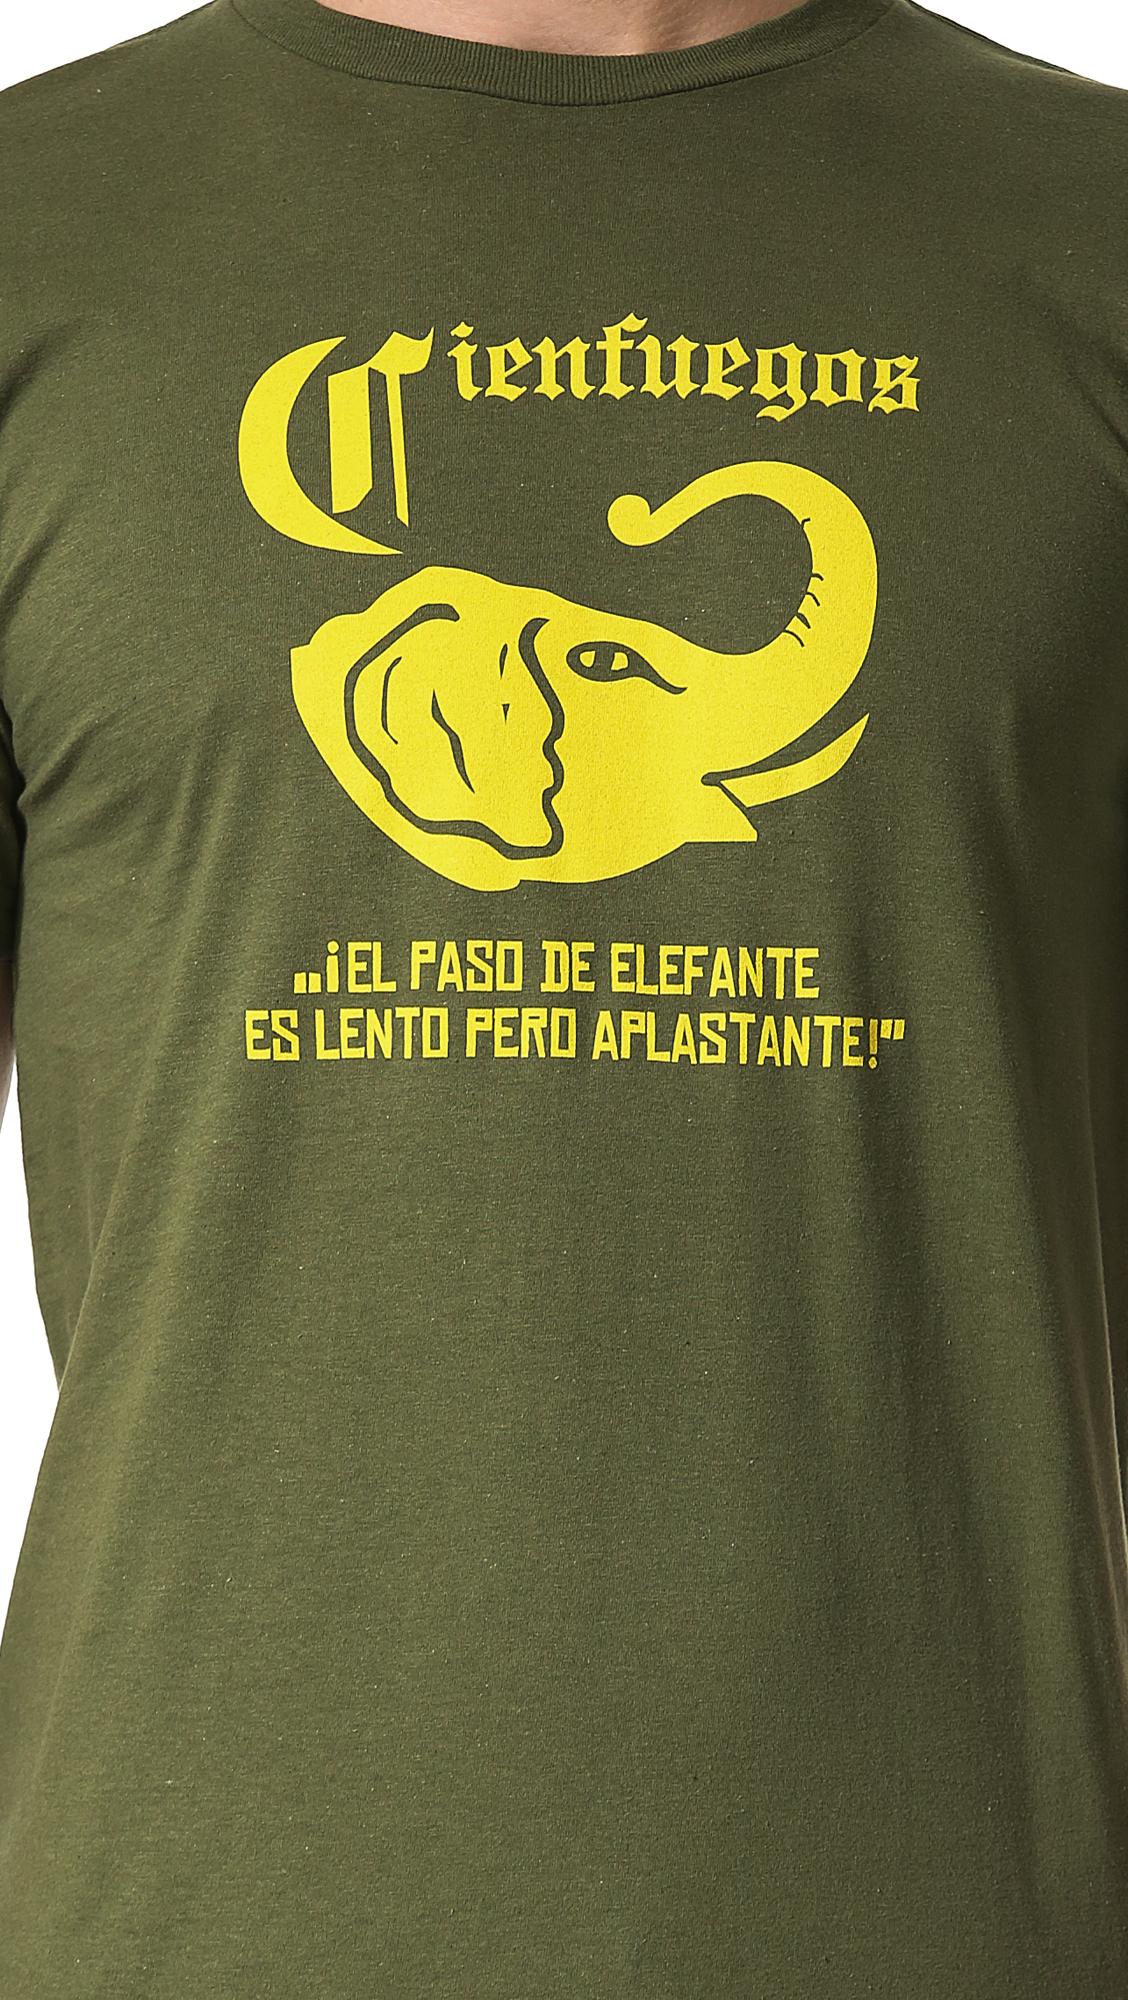 Ebbets Field Flannels Cienfuegos Elefantes Tshirt in Olive (Green) for Men